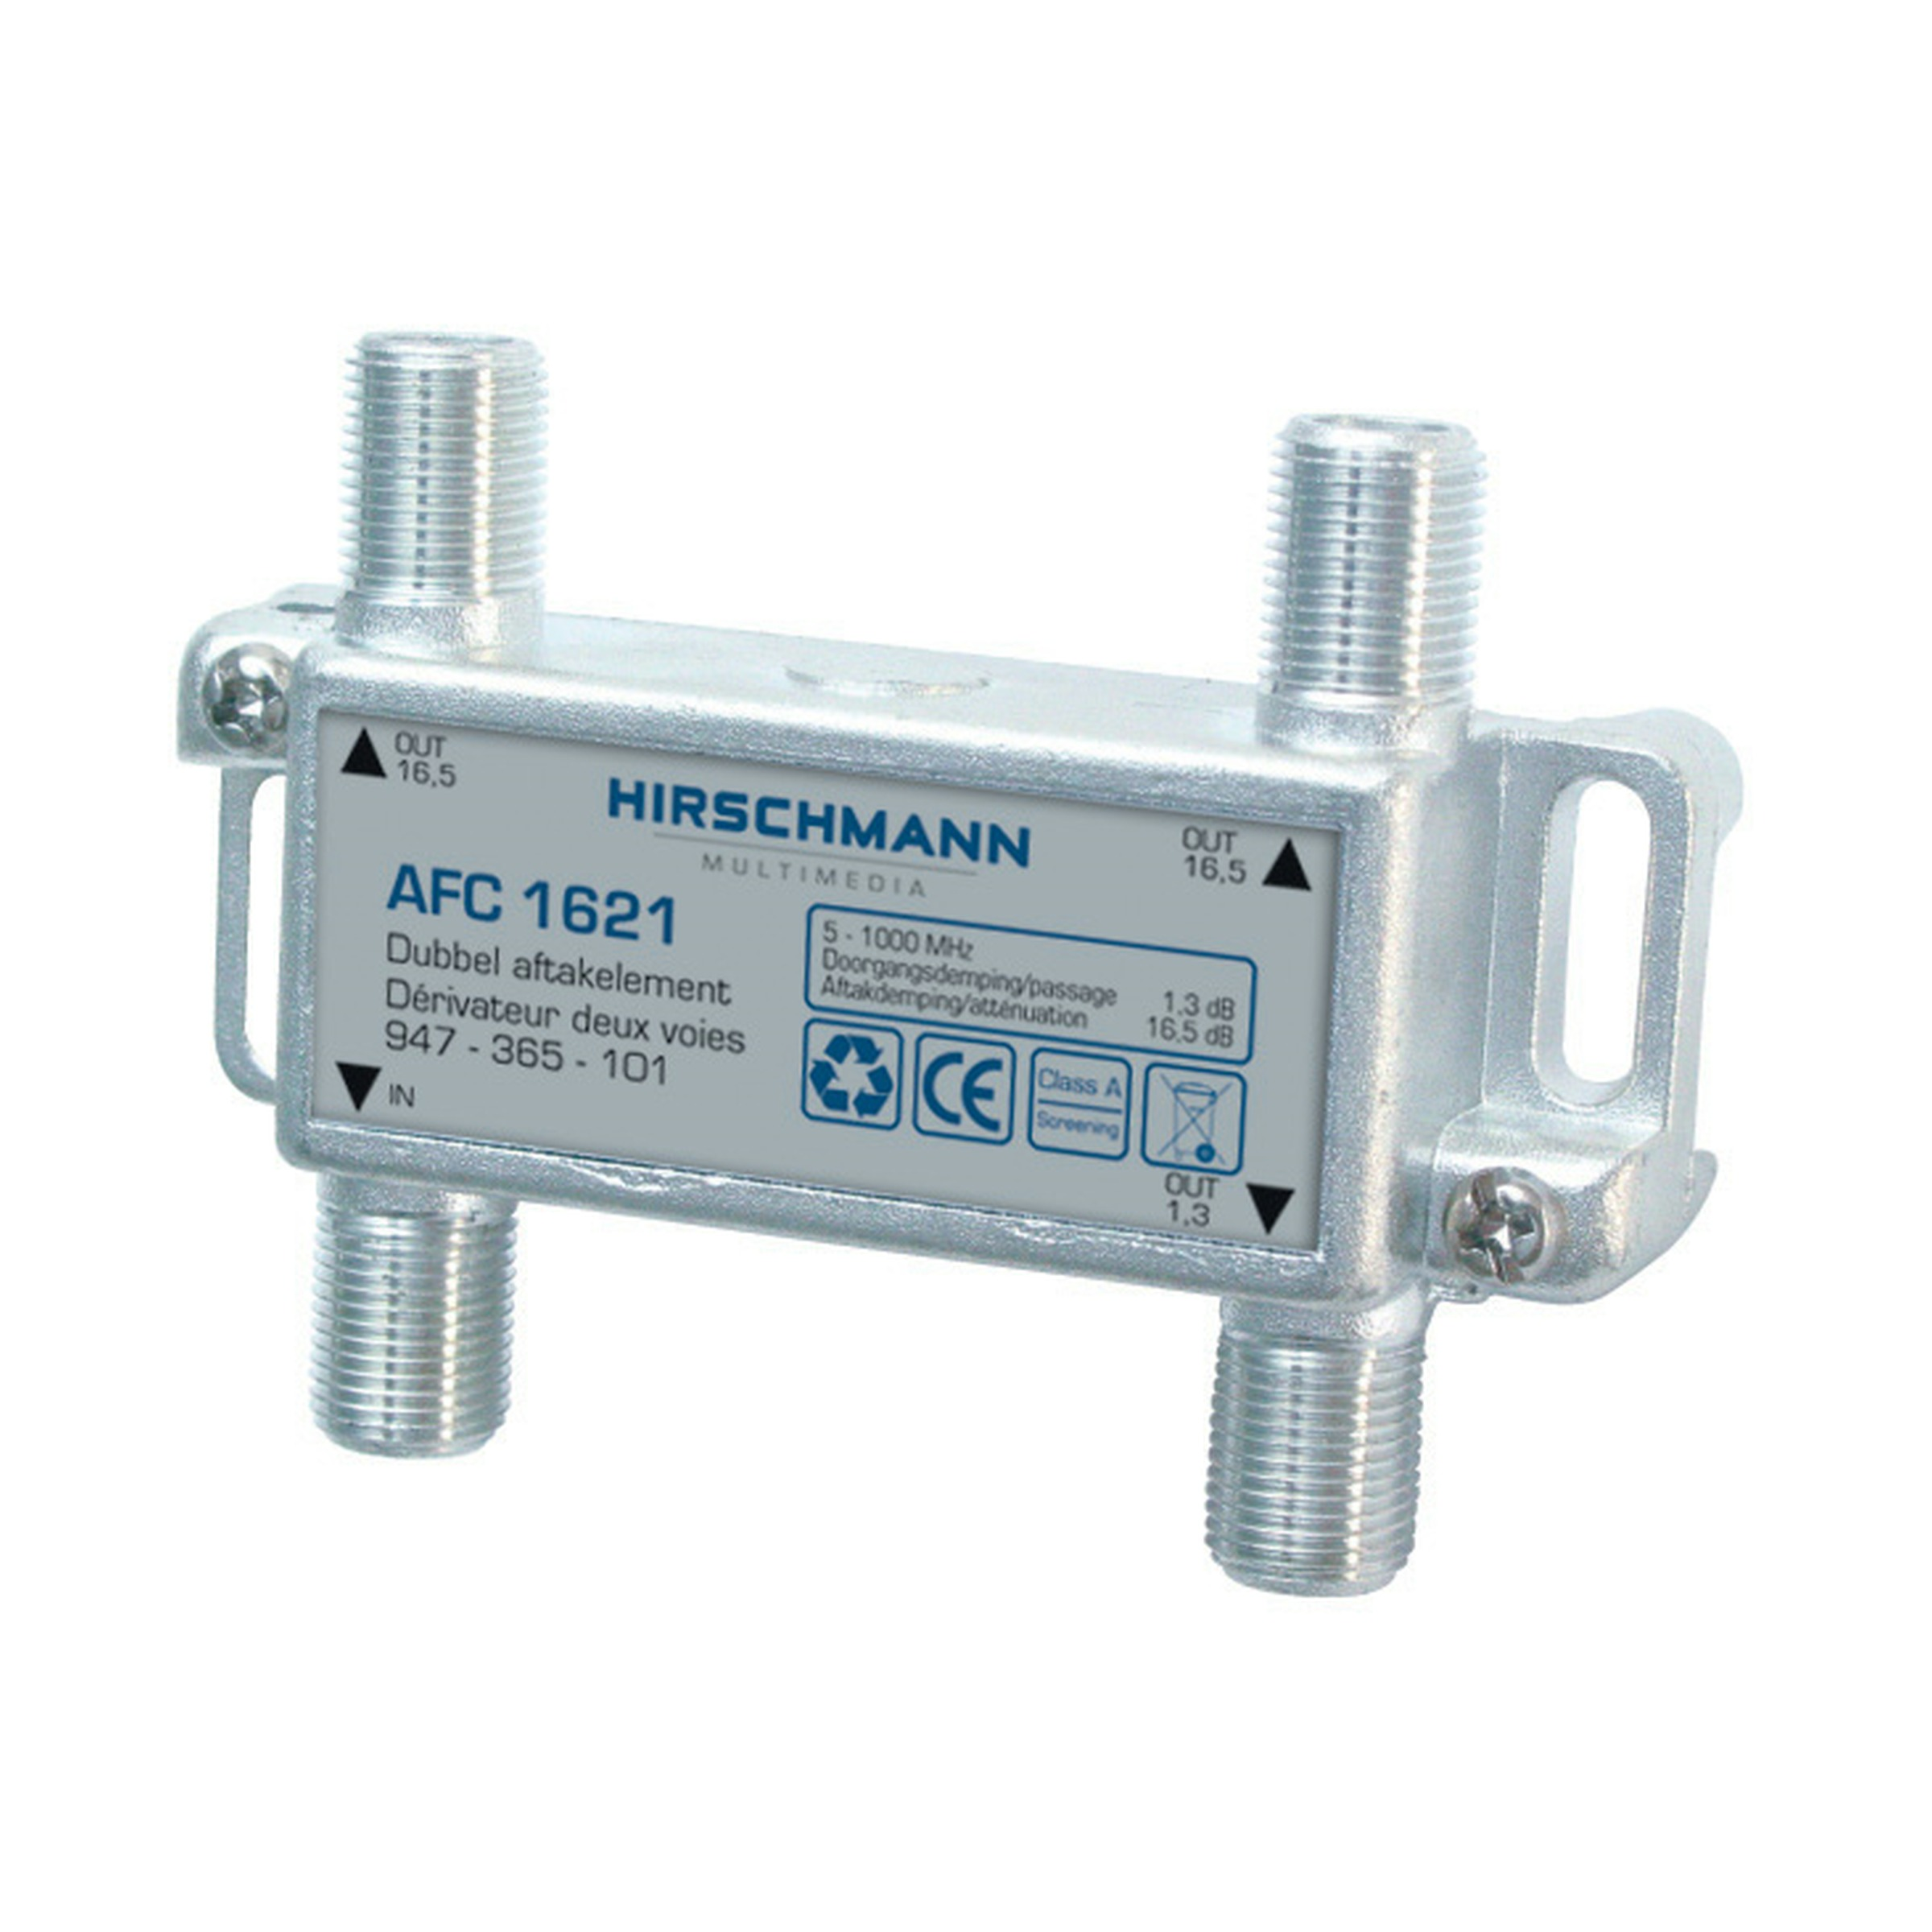 Hirschmann aftakelement 2 voudig F-connector AFC1621